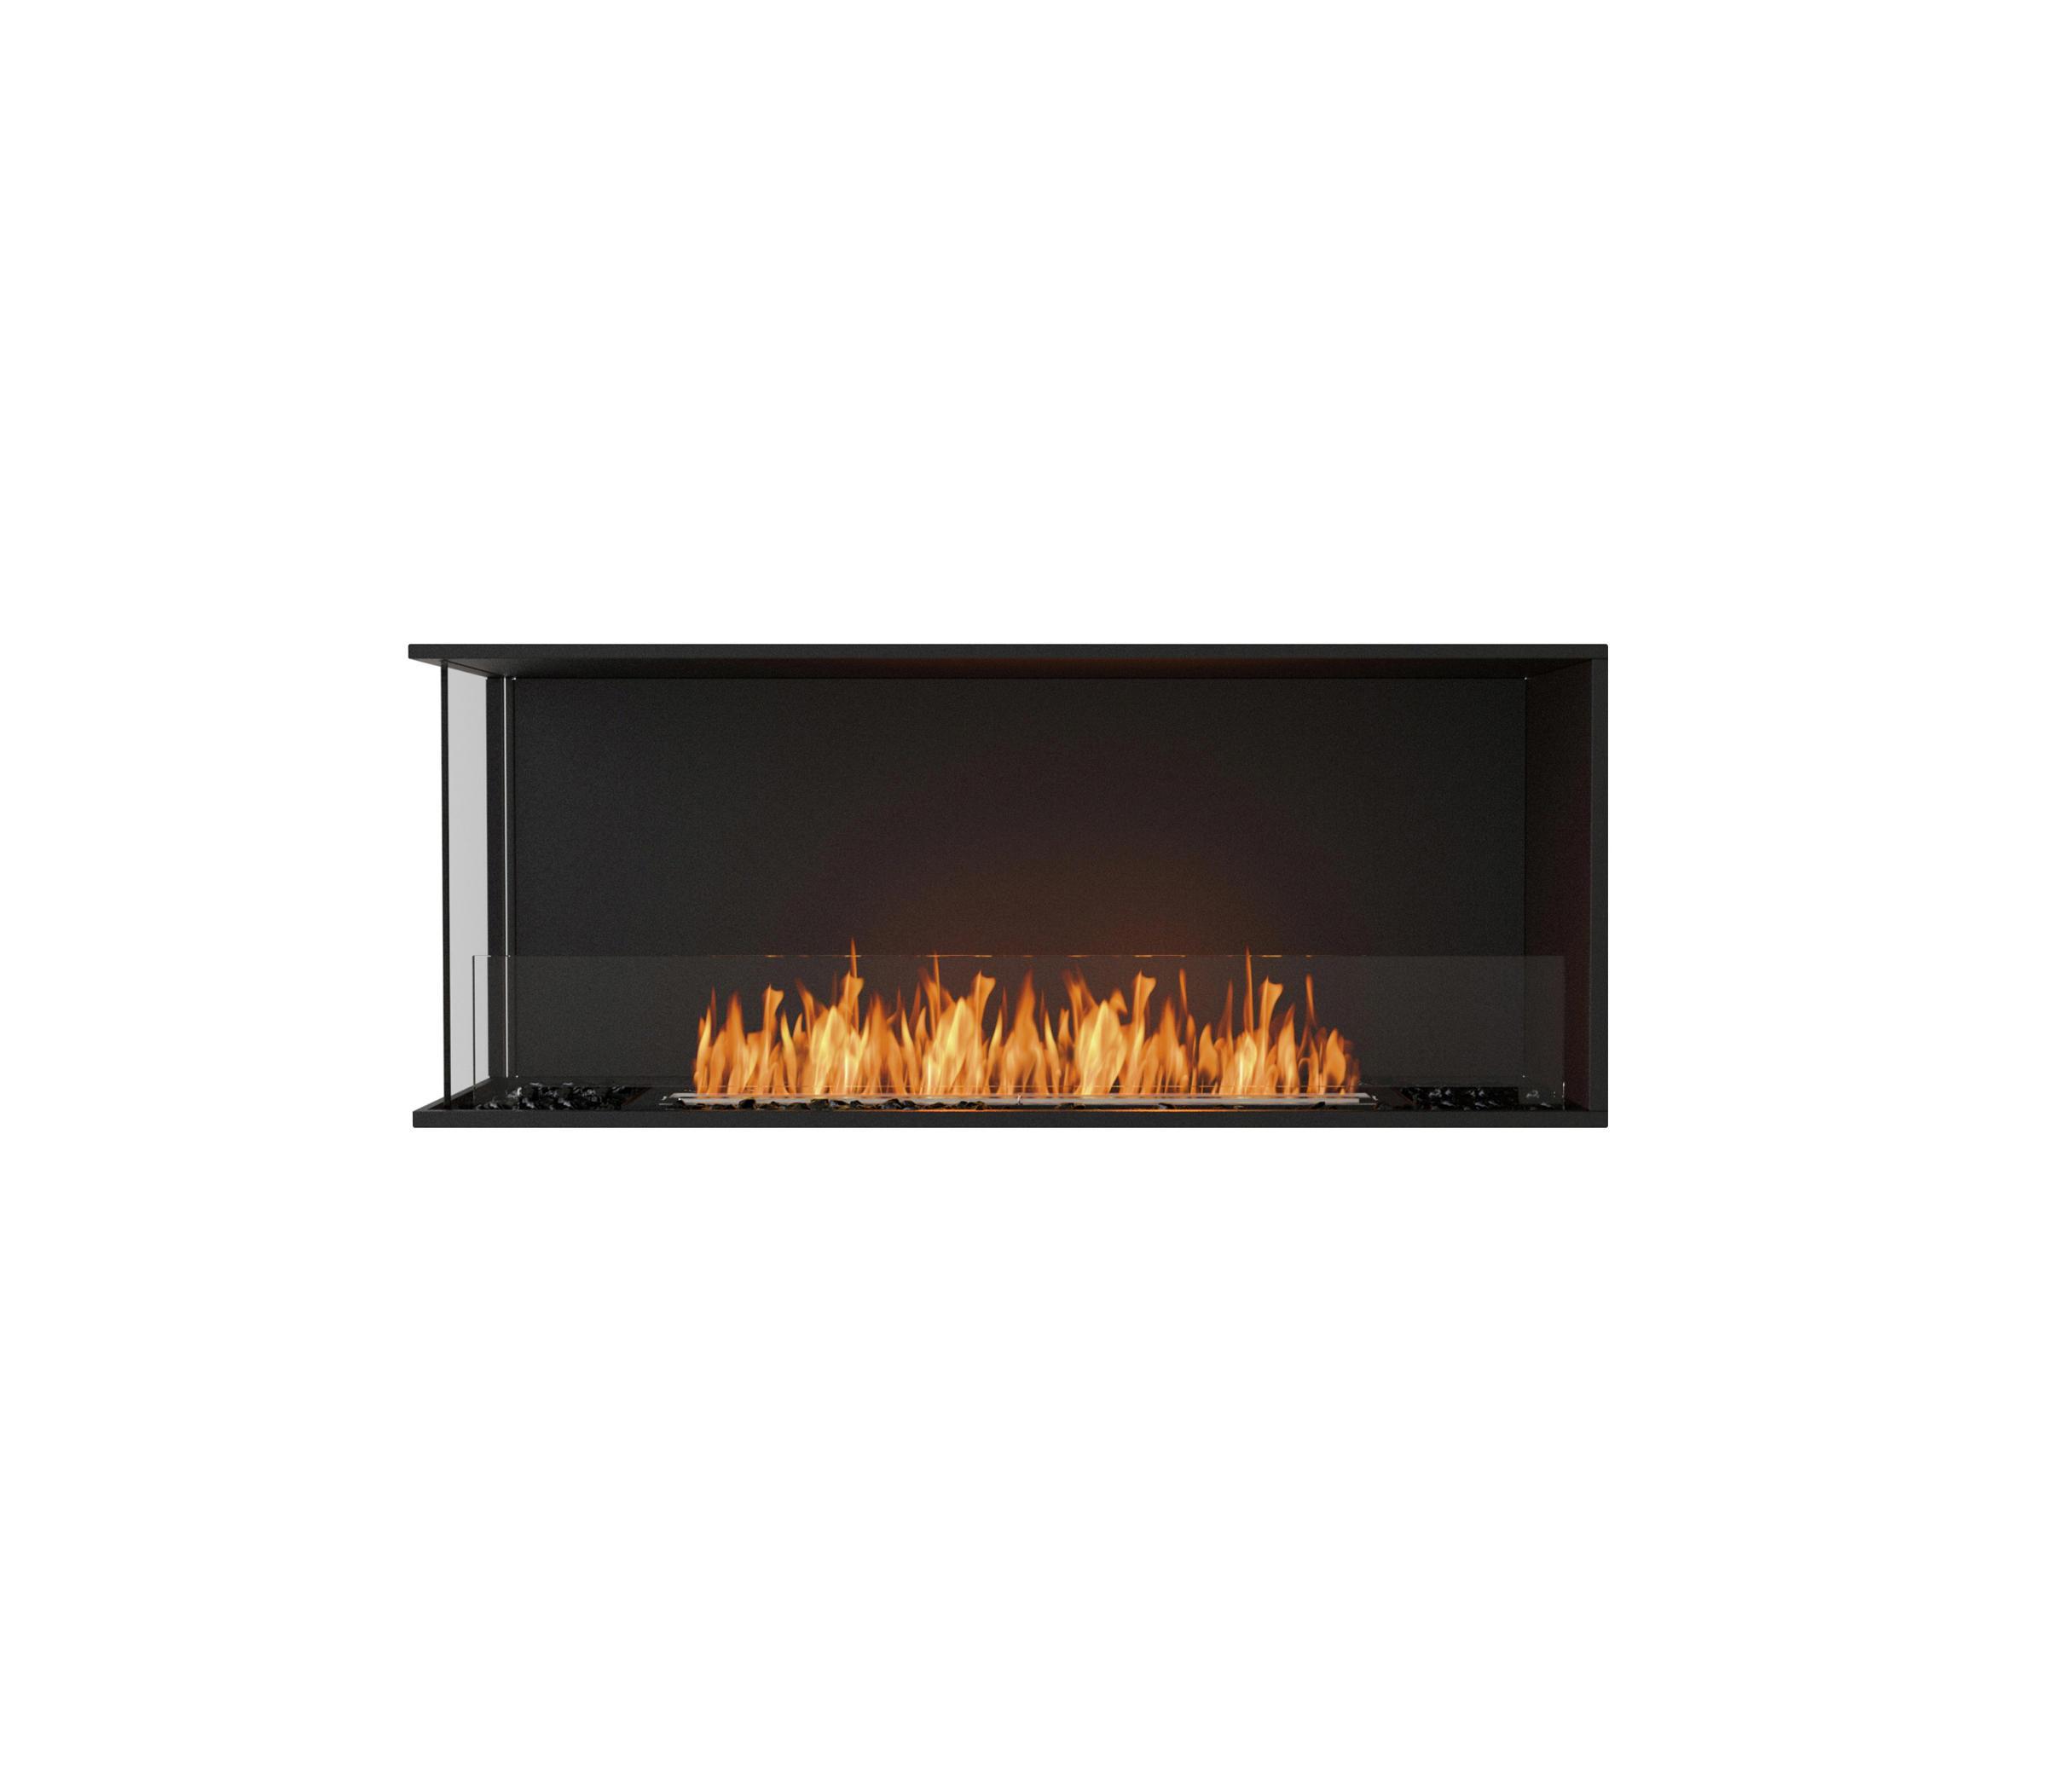 Flex 50lc Fireplace Inserts From Ecosmart Fire Architonic